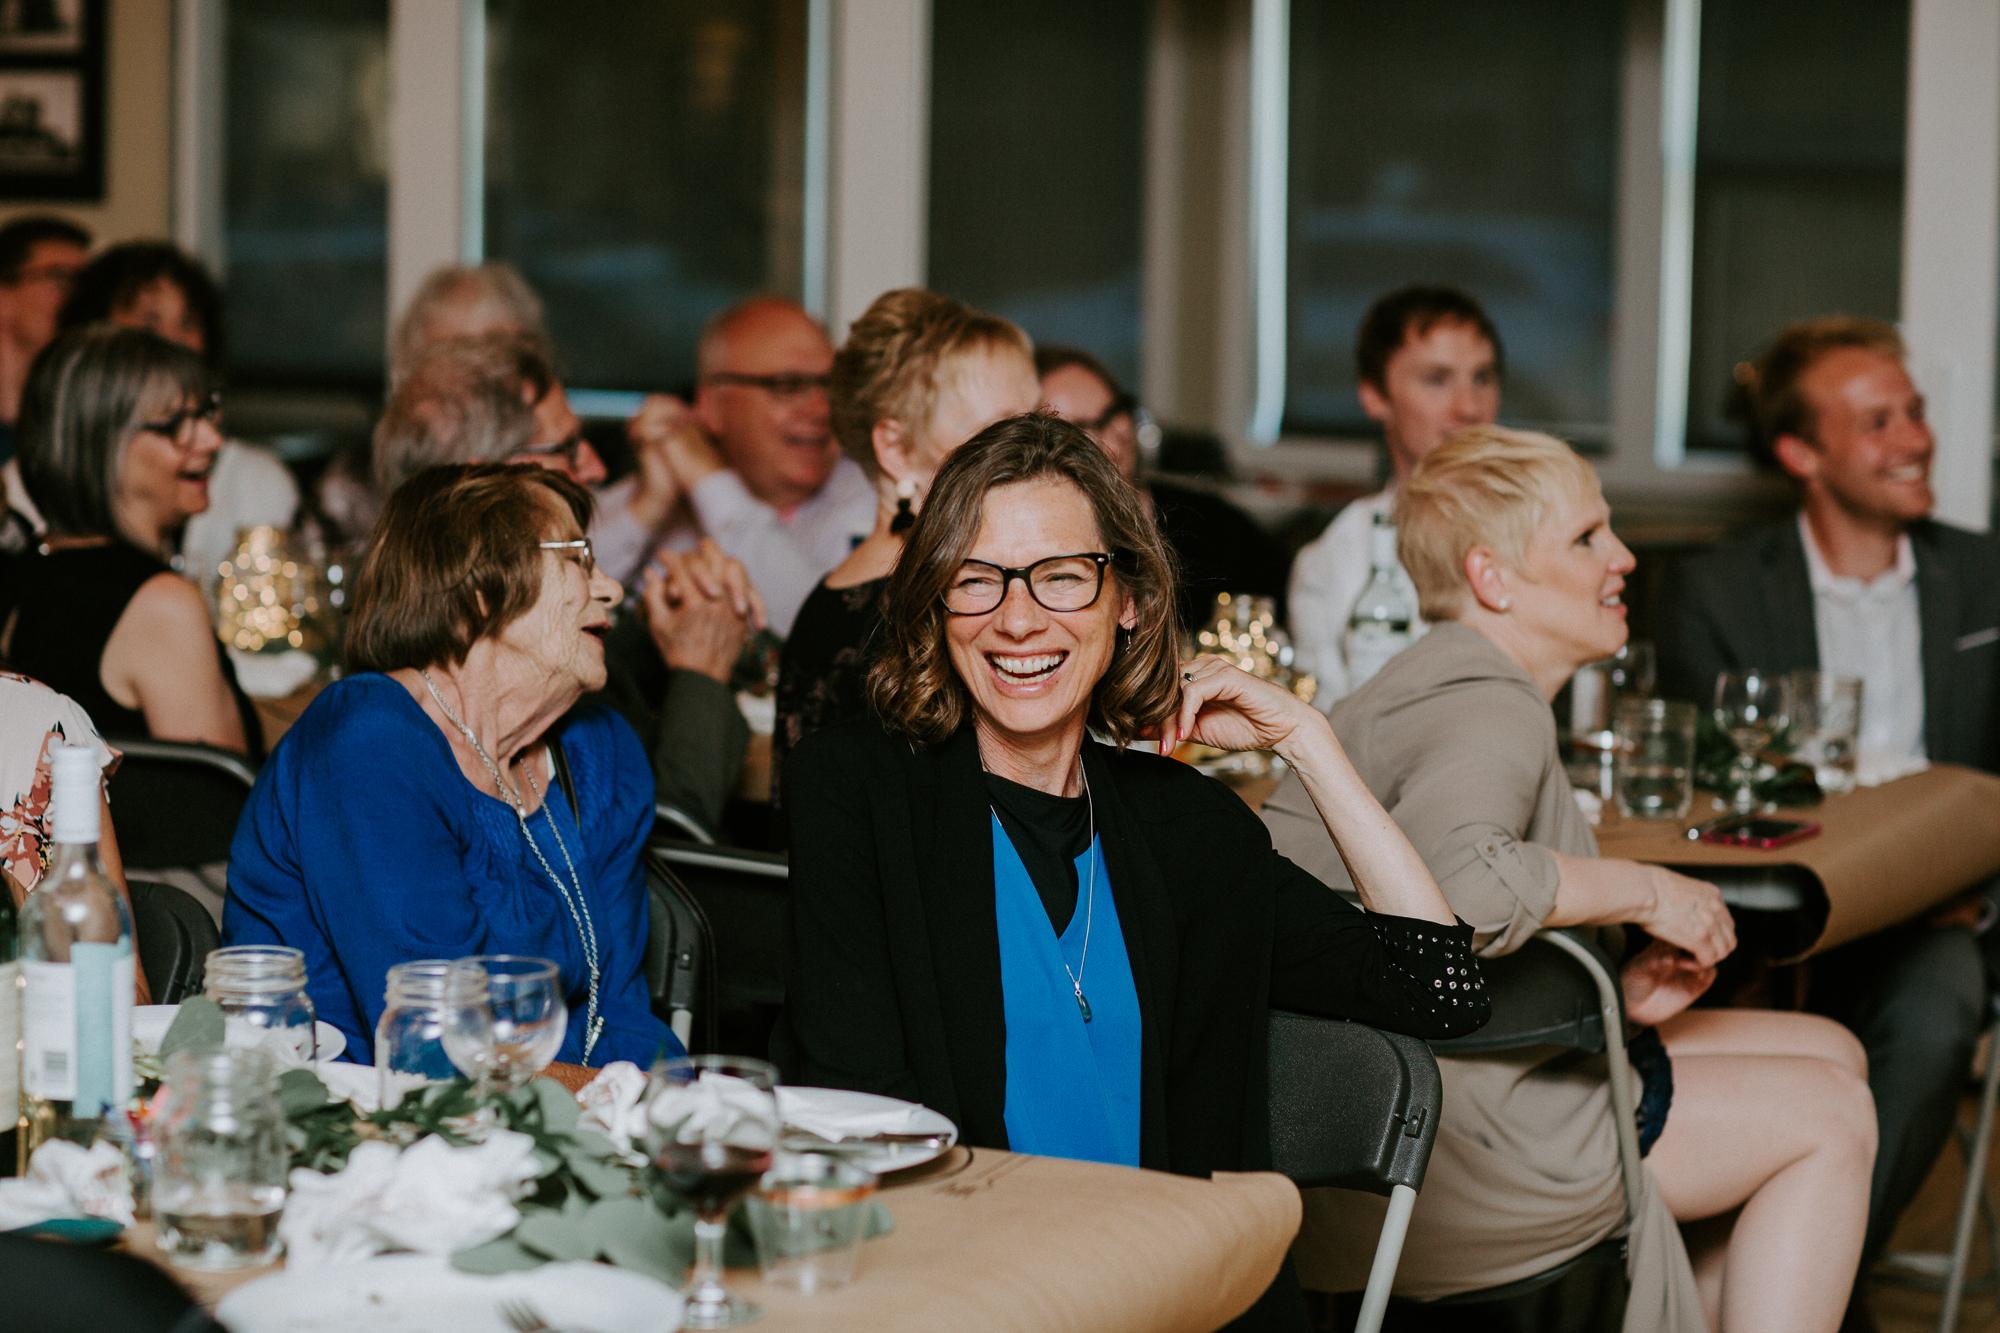 Calgary-wedding-photographer-am-85.jpg